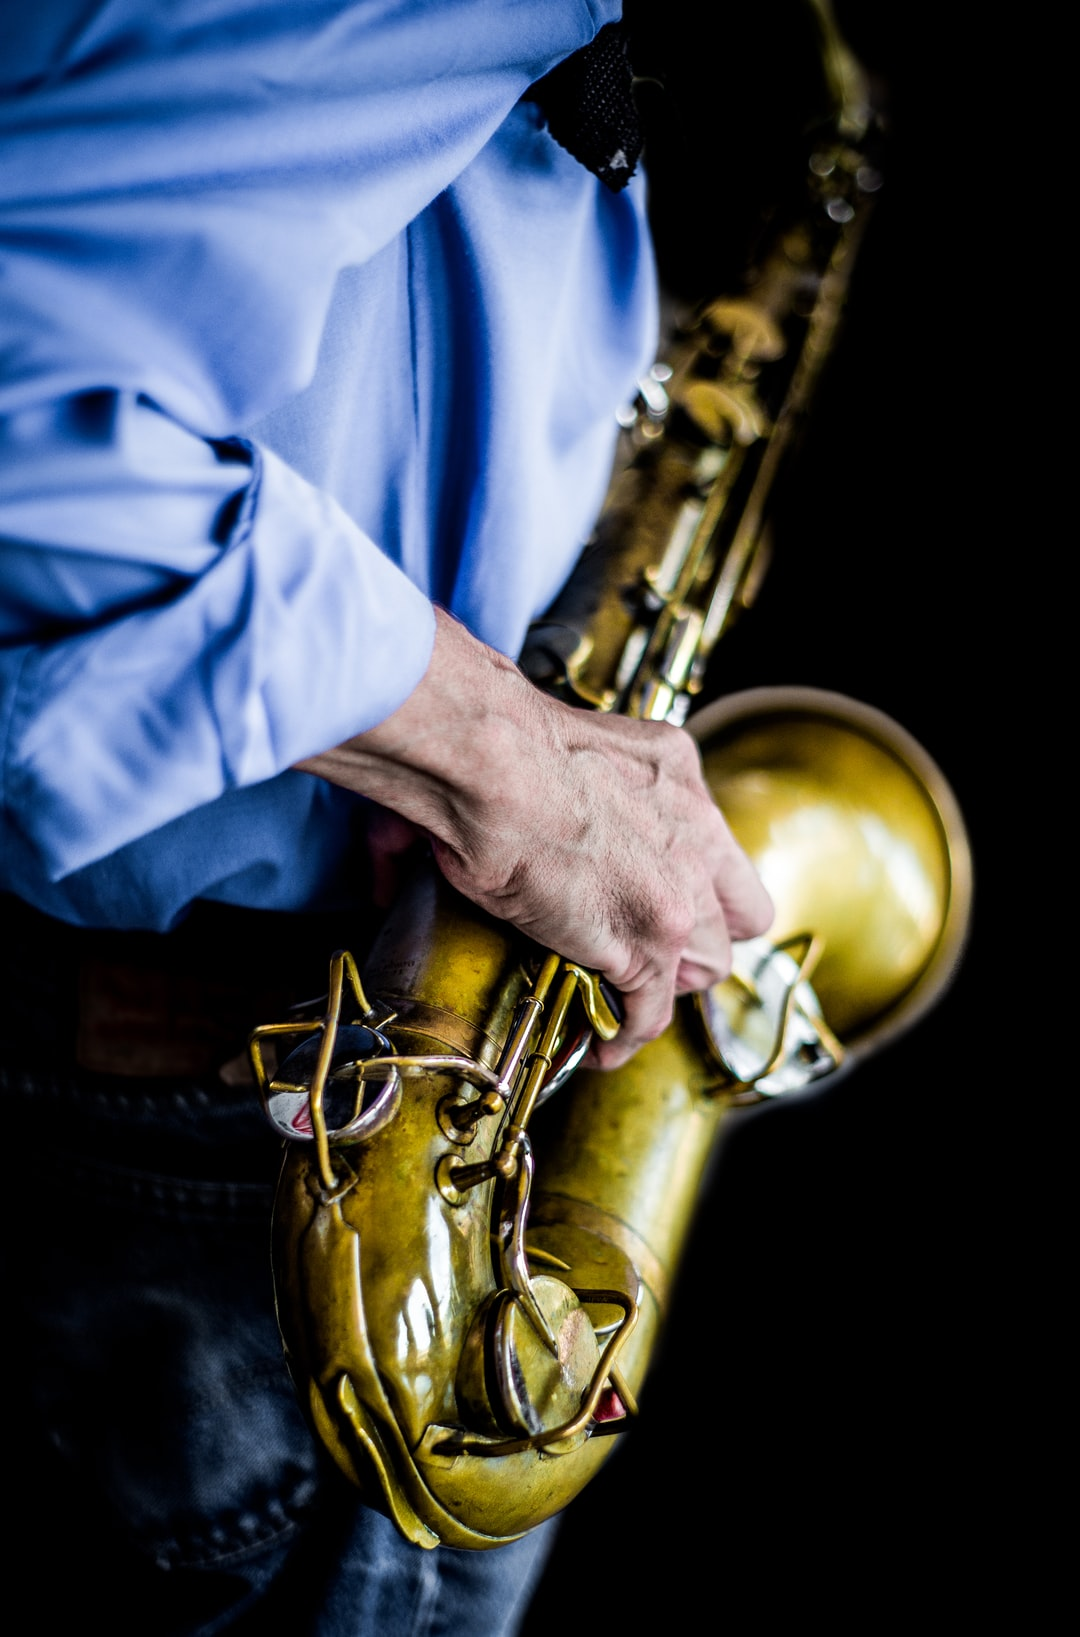 Hands of music